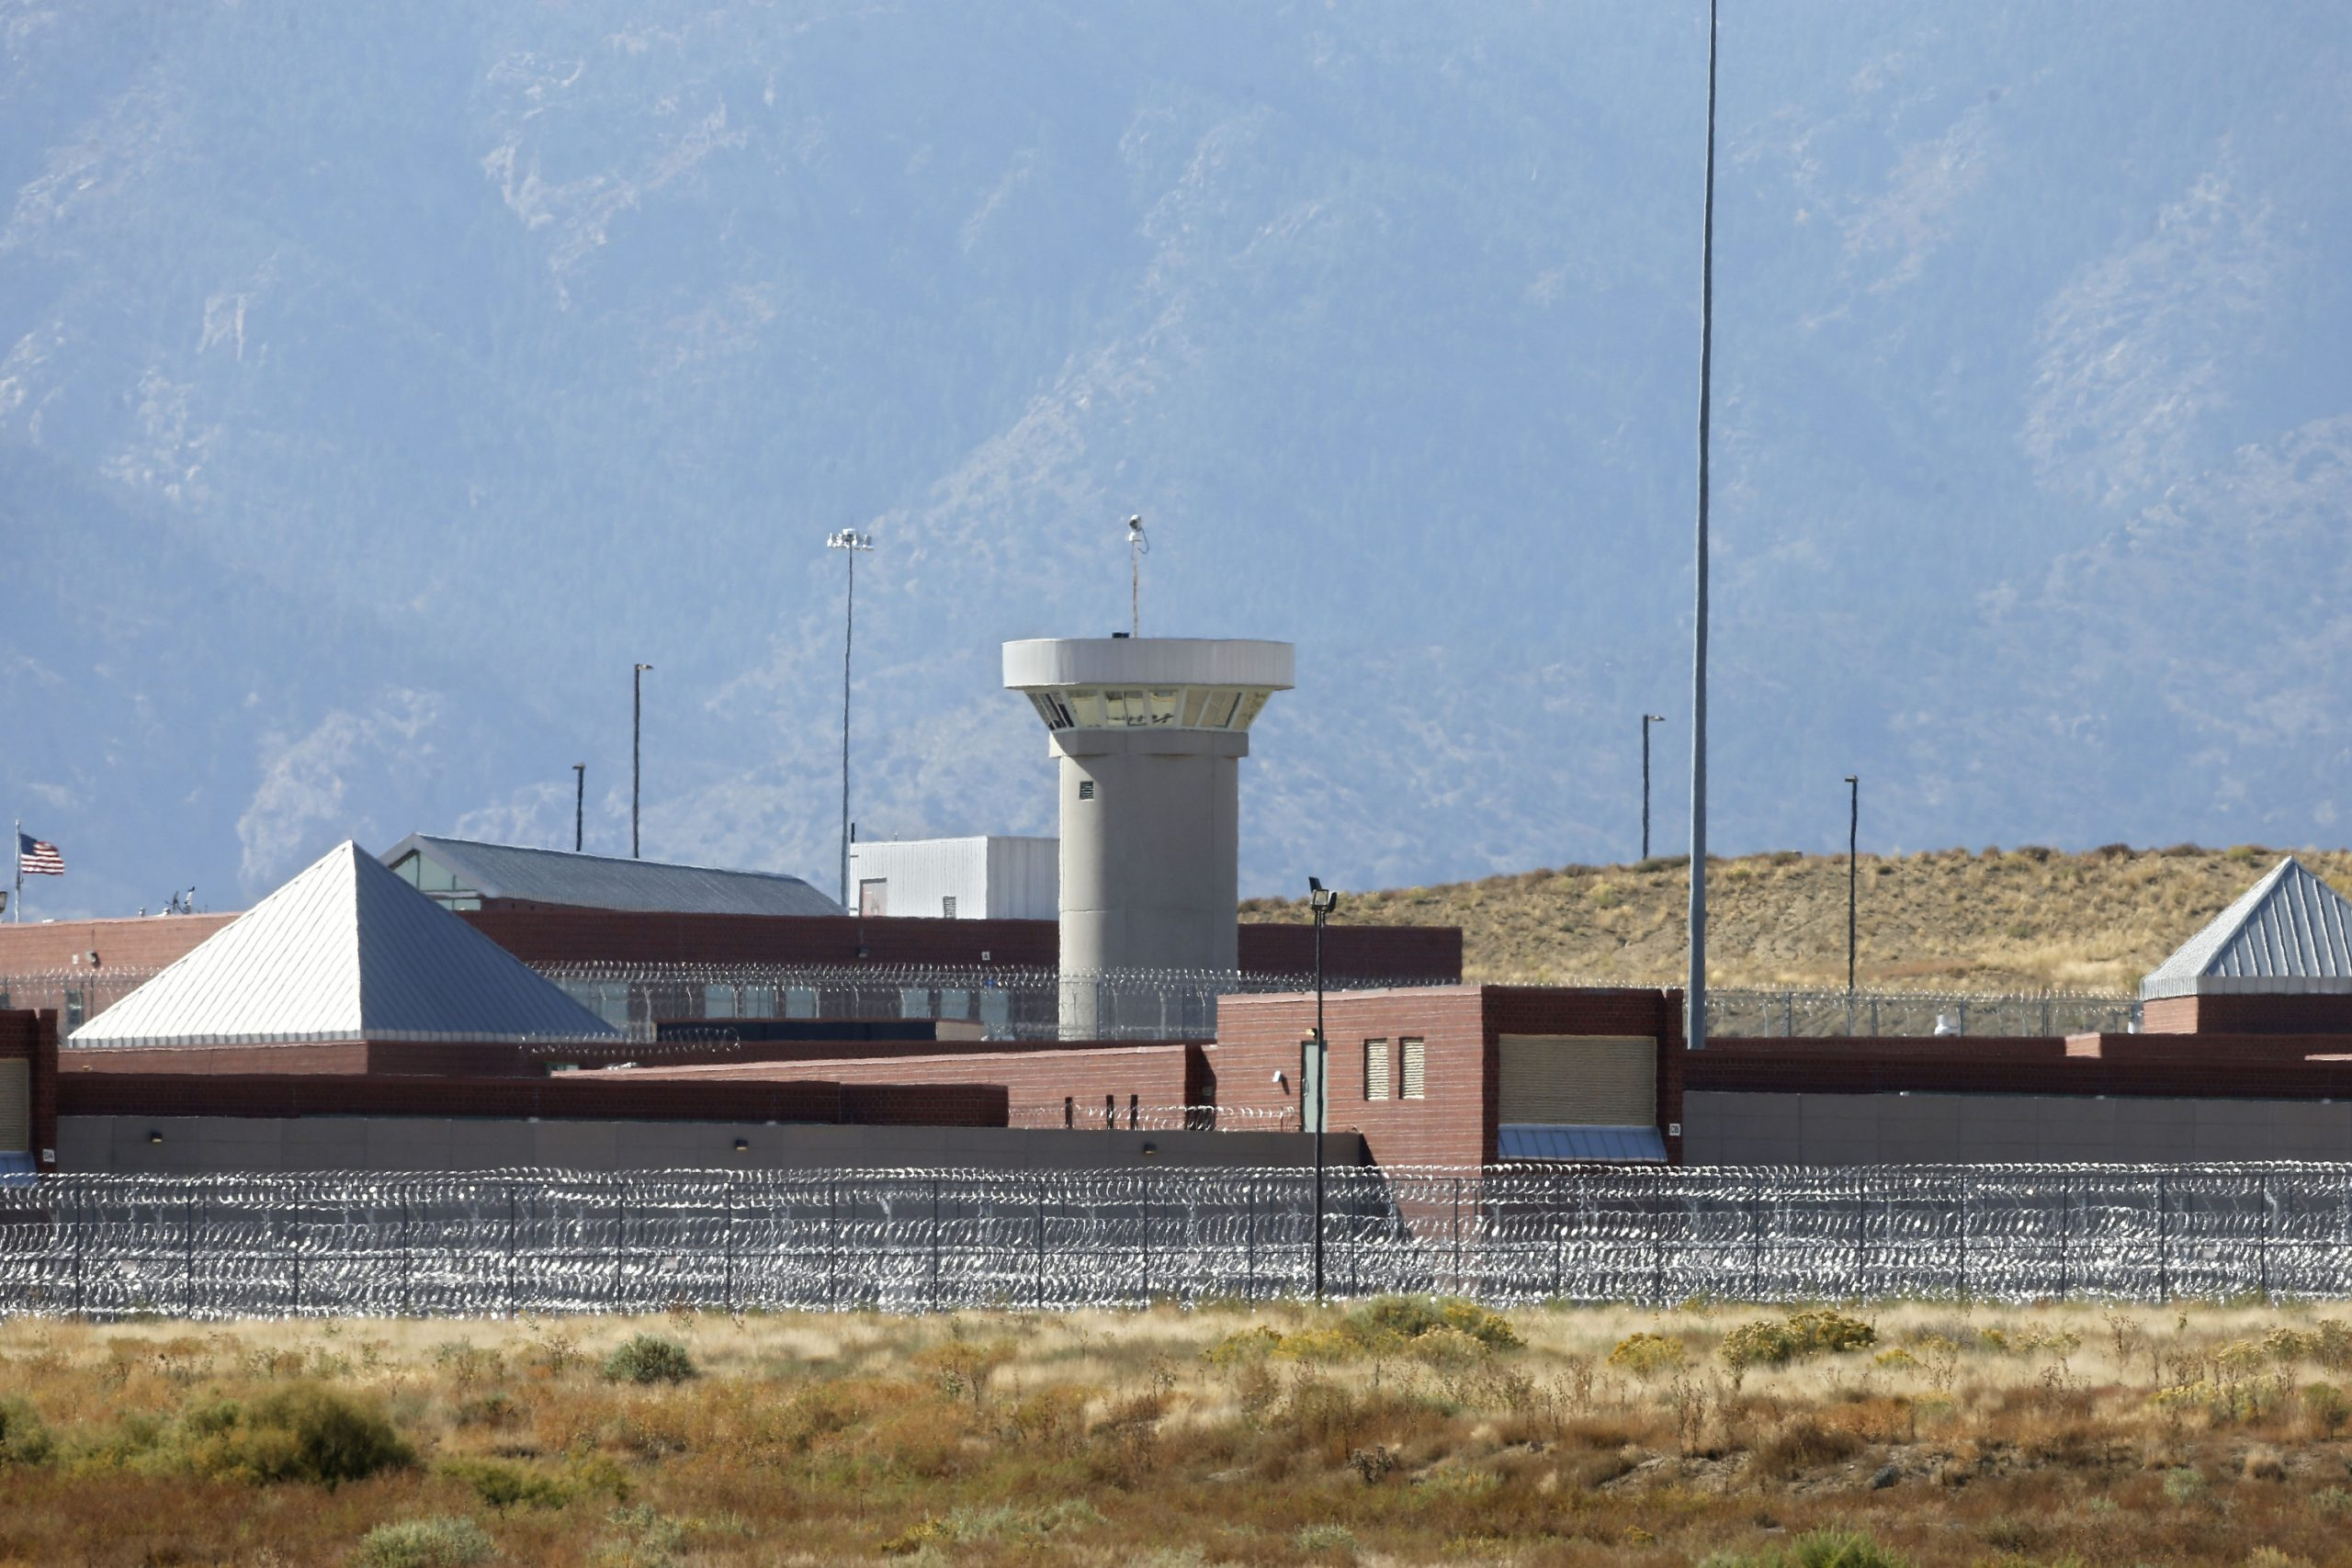 Closing Guantanamo-Colorado Sheriffs